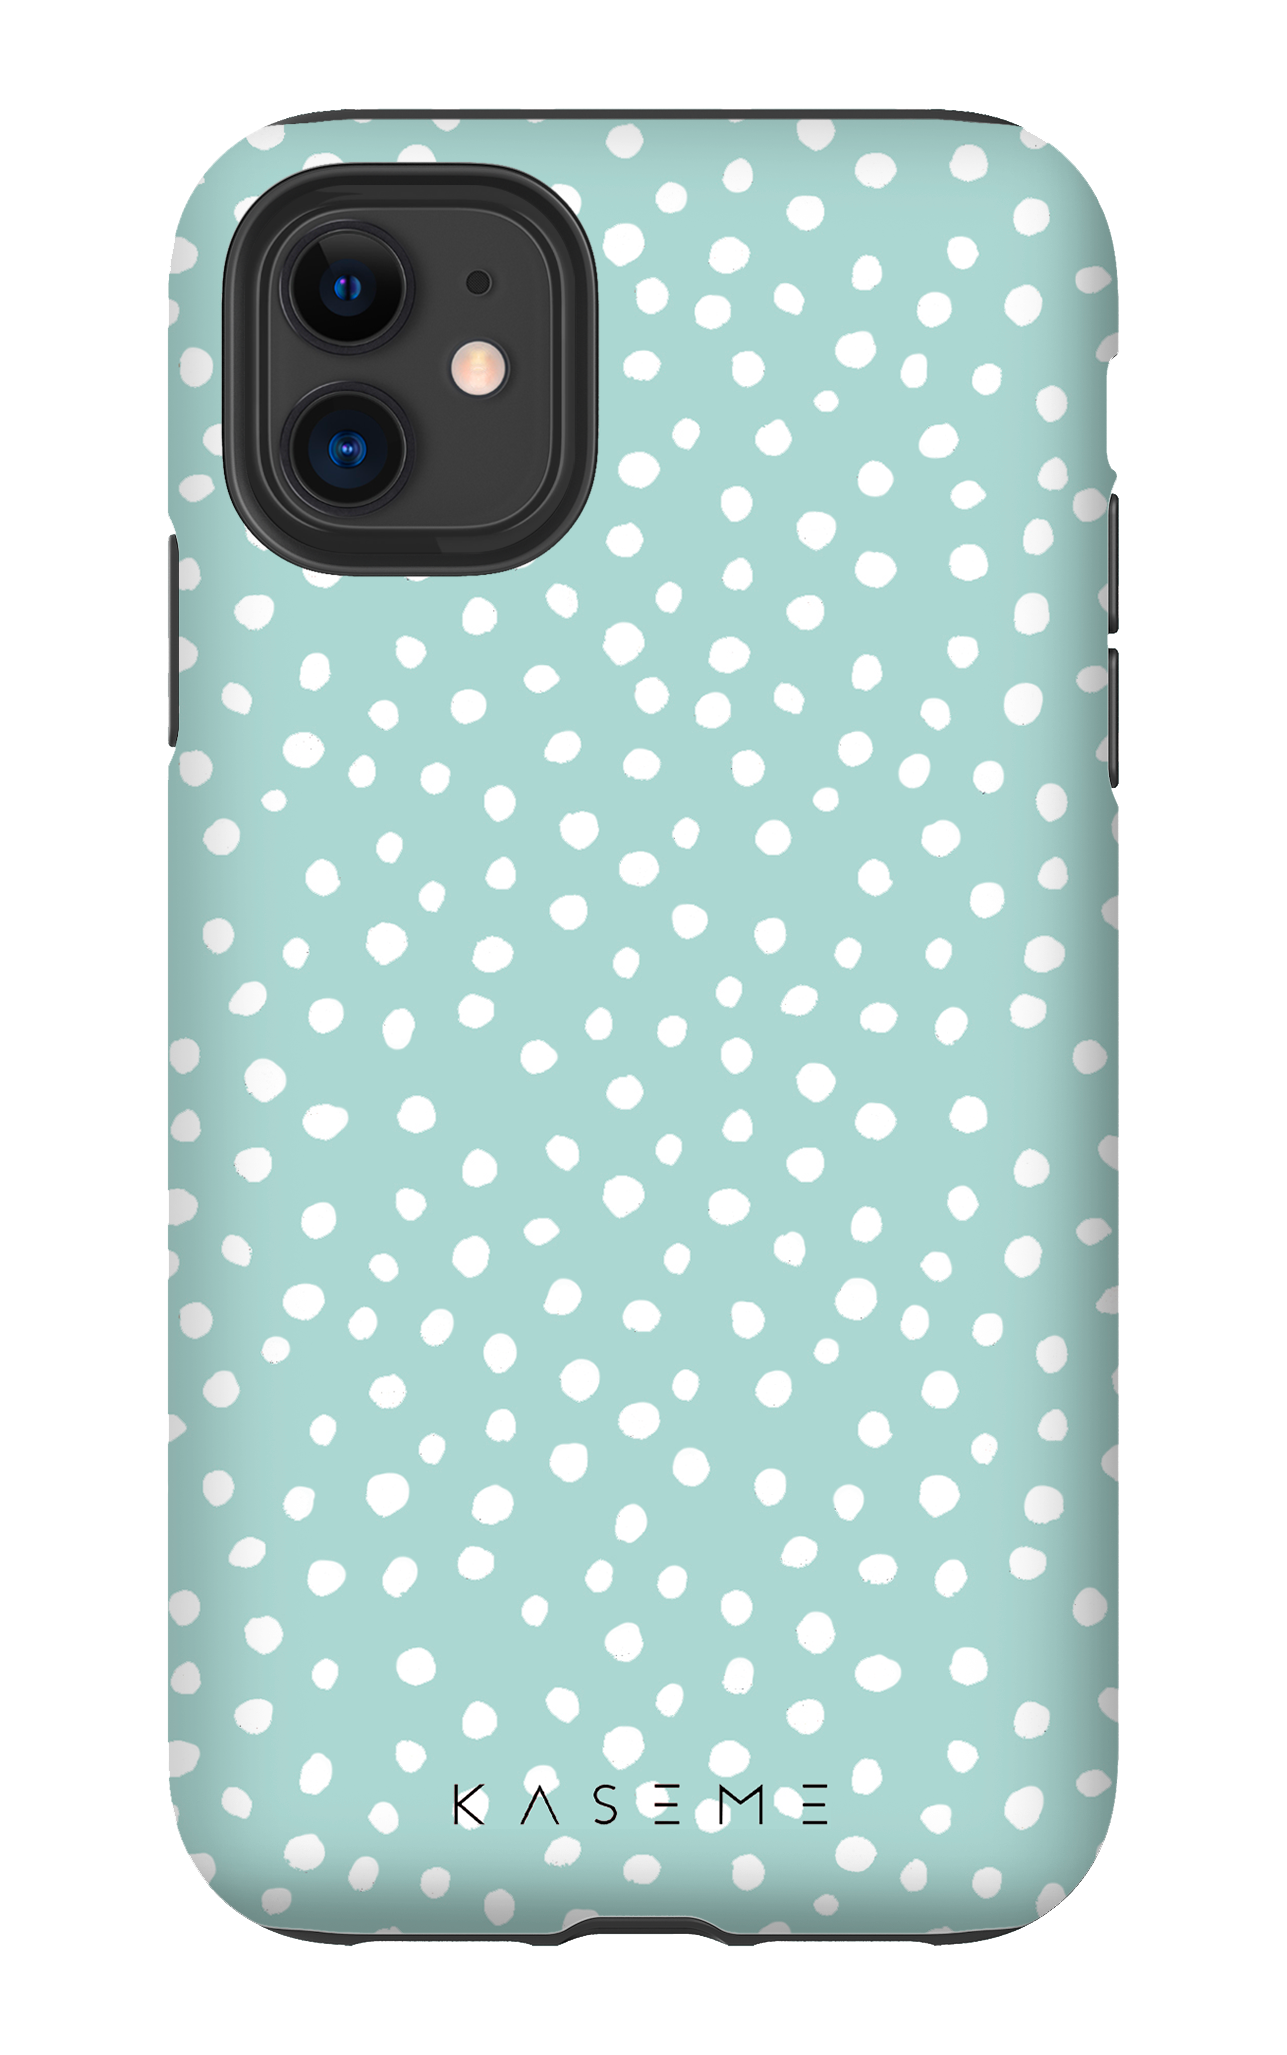 Precious phone case